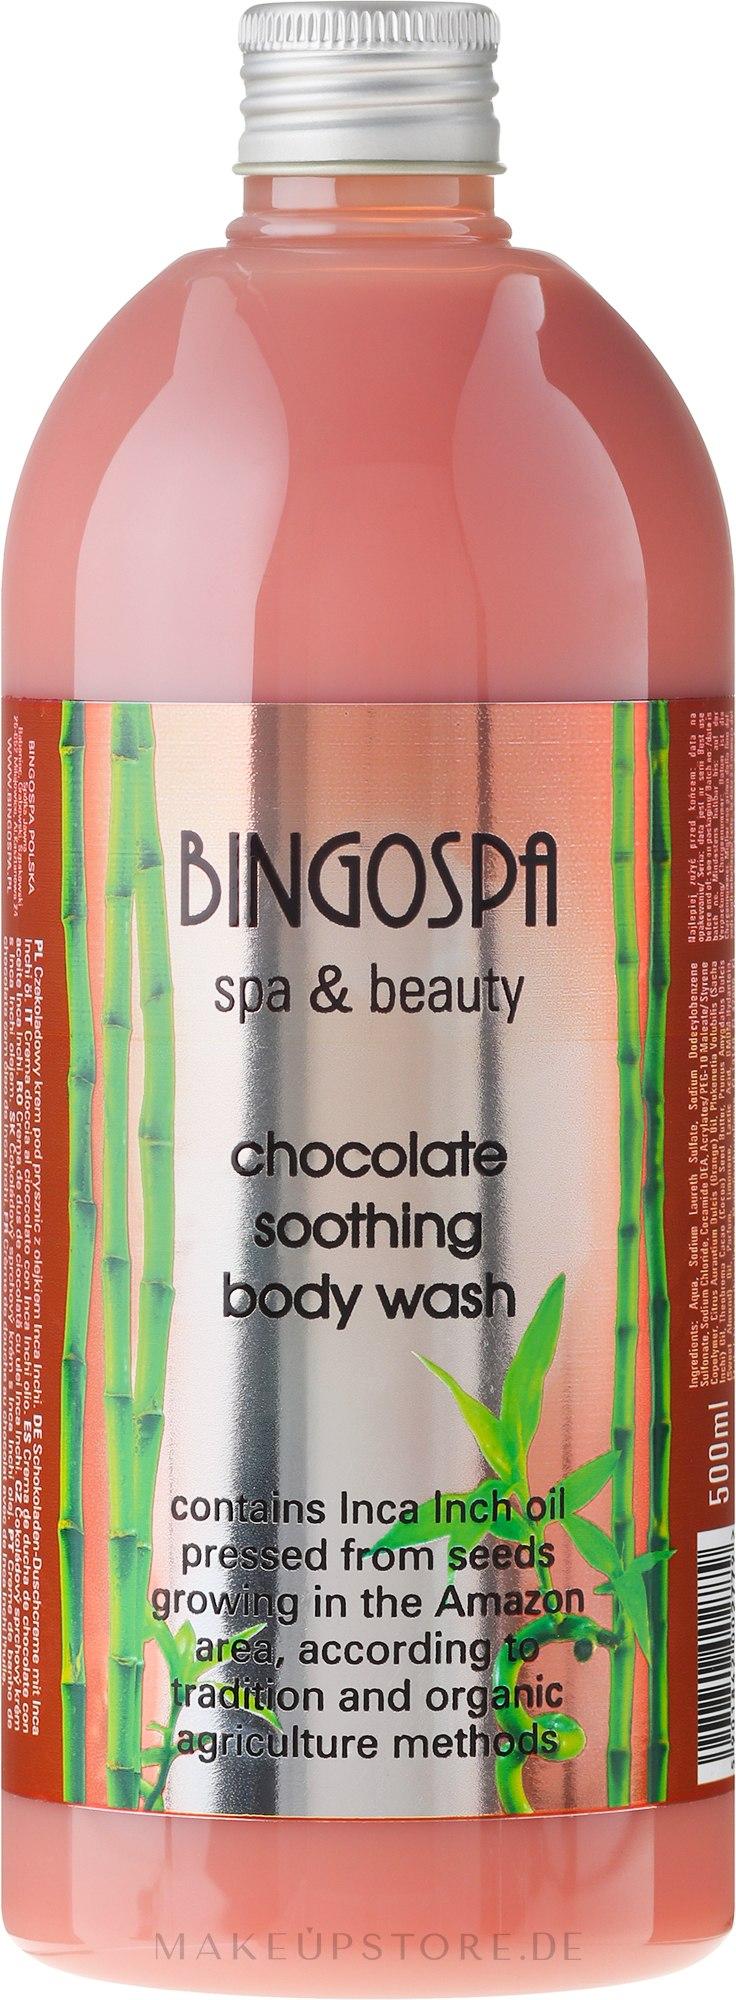 Schoko Duschcreme mit Bio Inca Inchi Öl - BingoSpa Chocolate Soothing Body Wash — Bild 500 ml